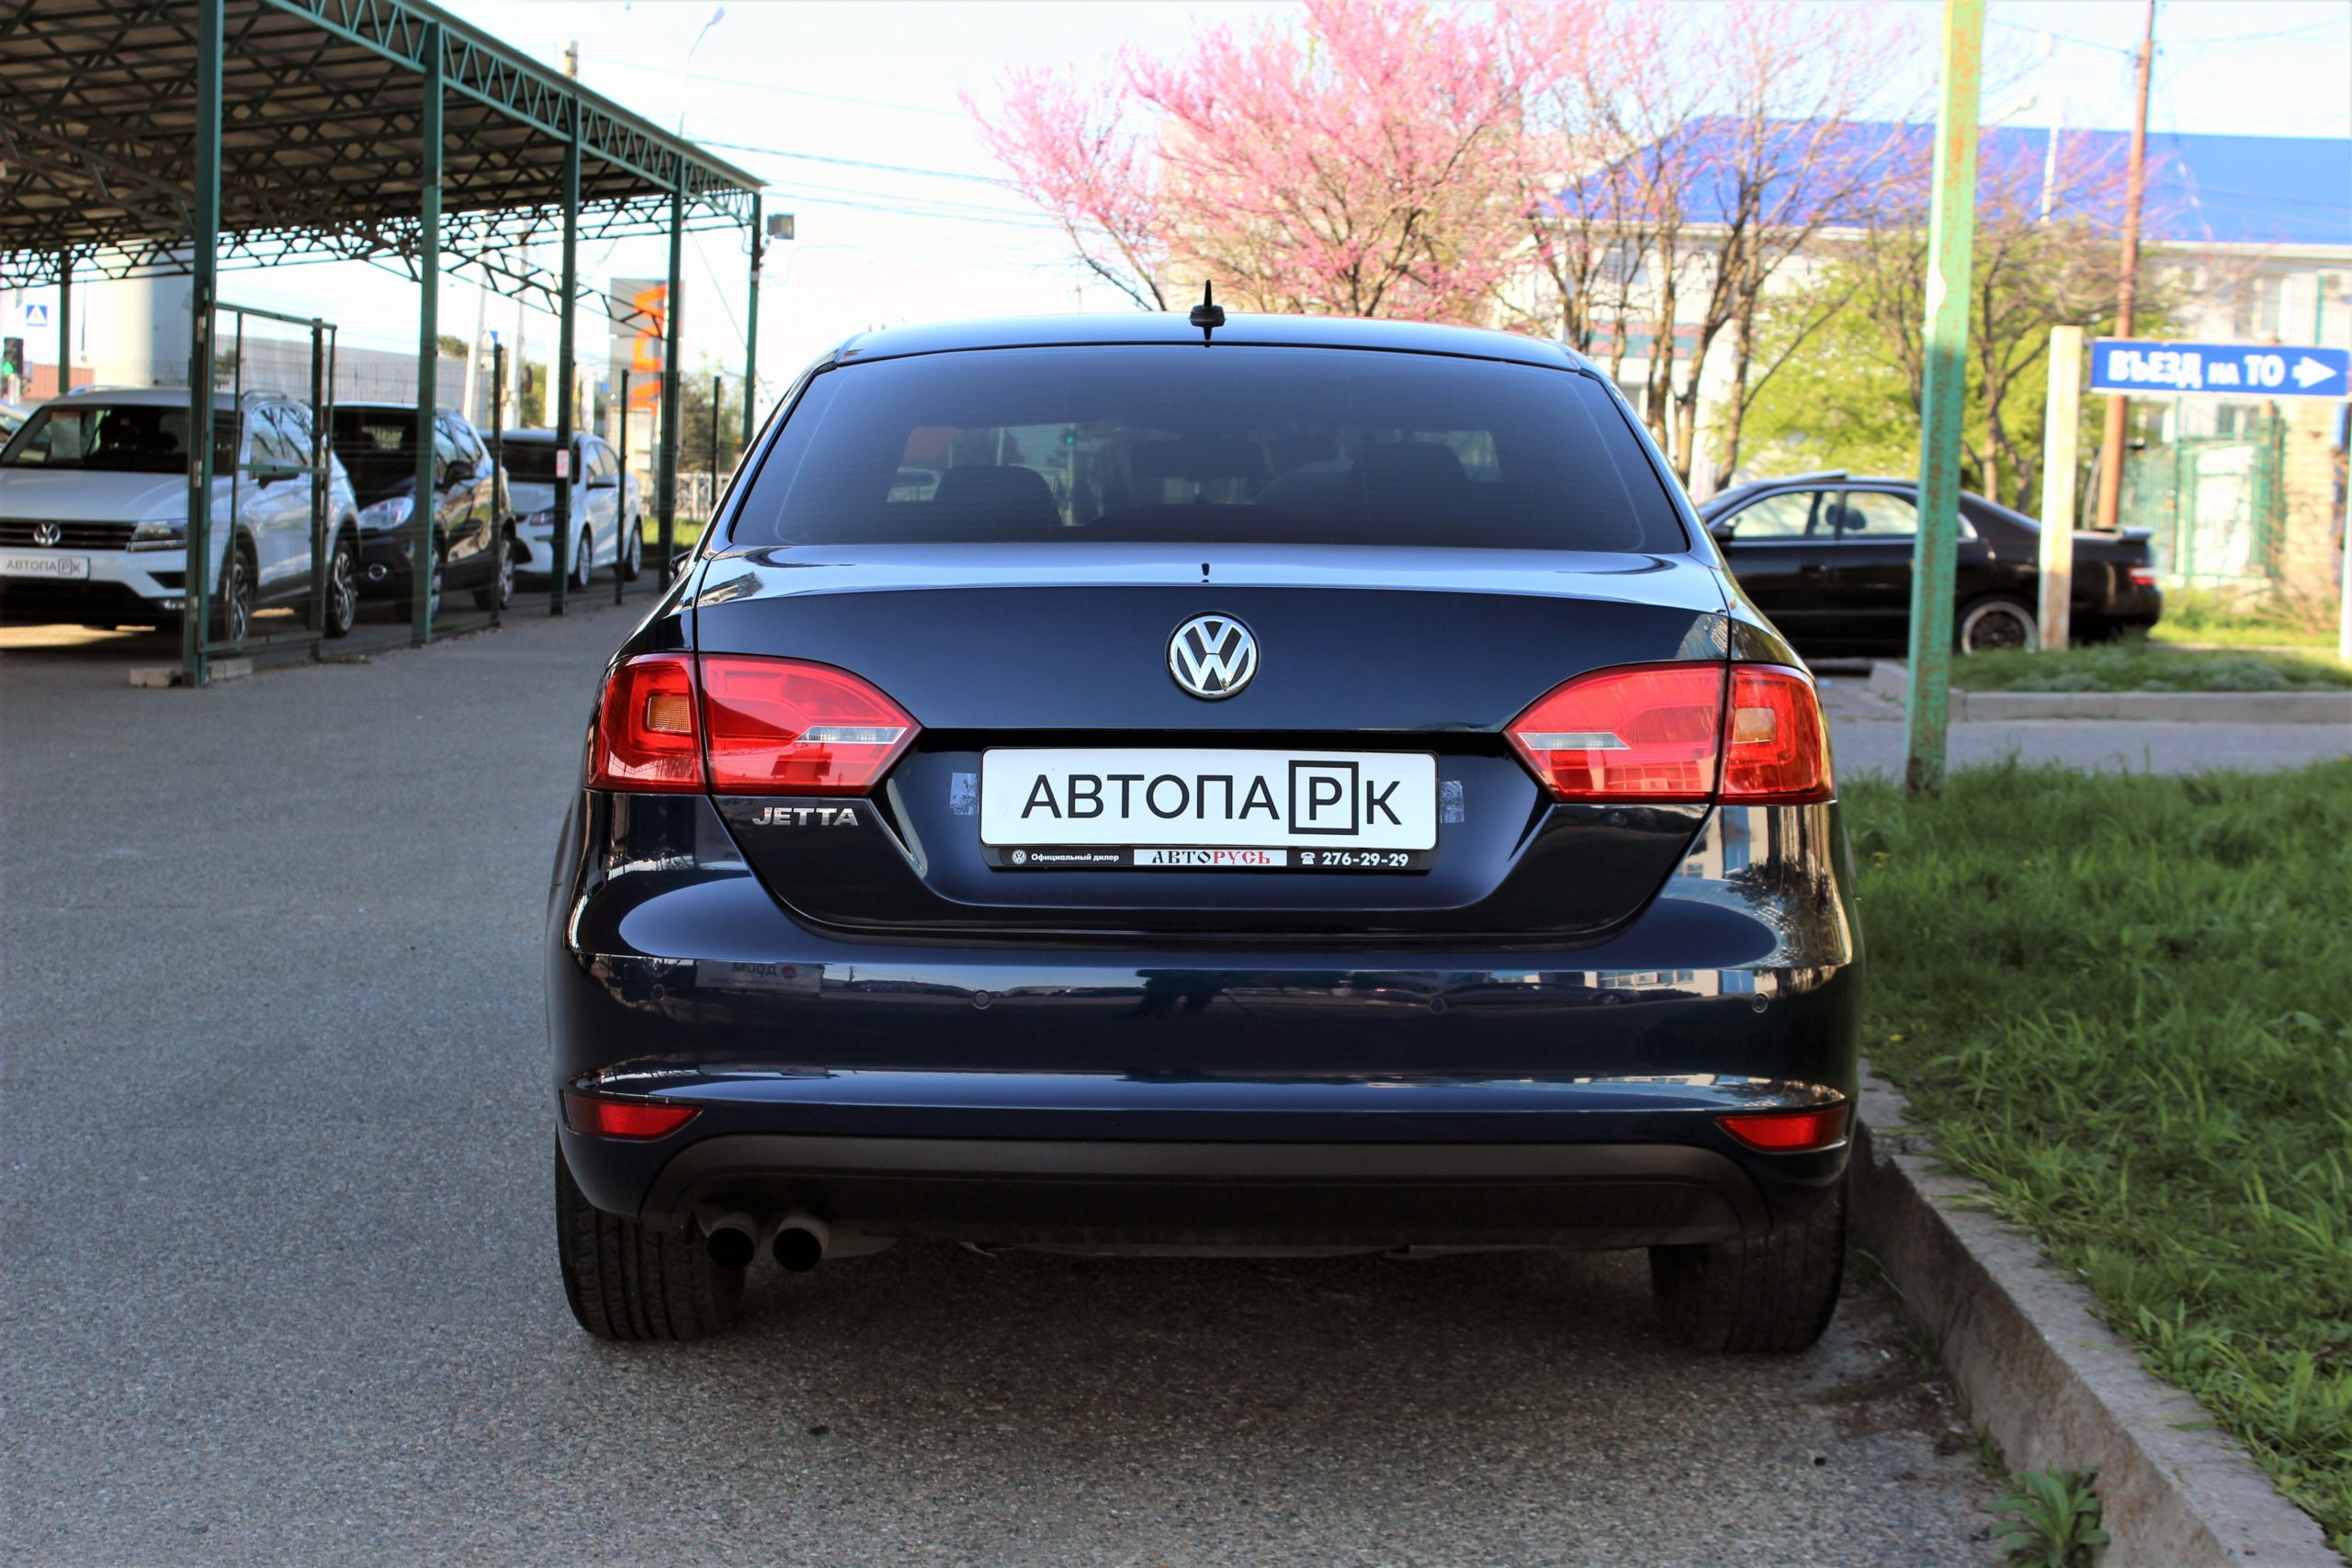 Купить Volkswagen Jetta (Синий) - Автопарк Ставрополь